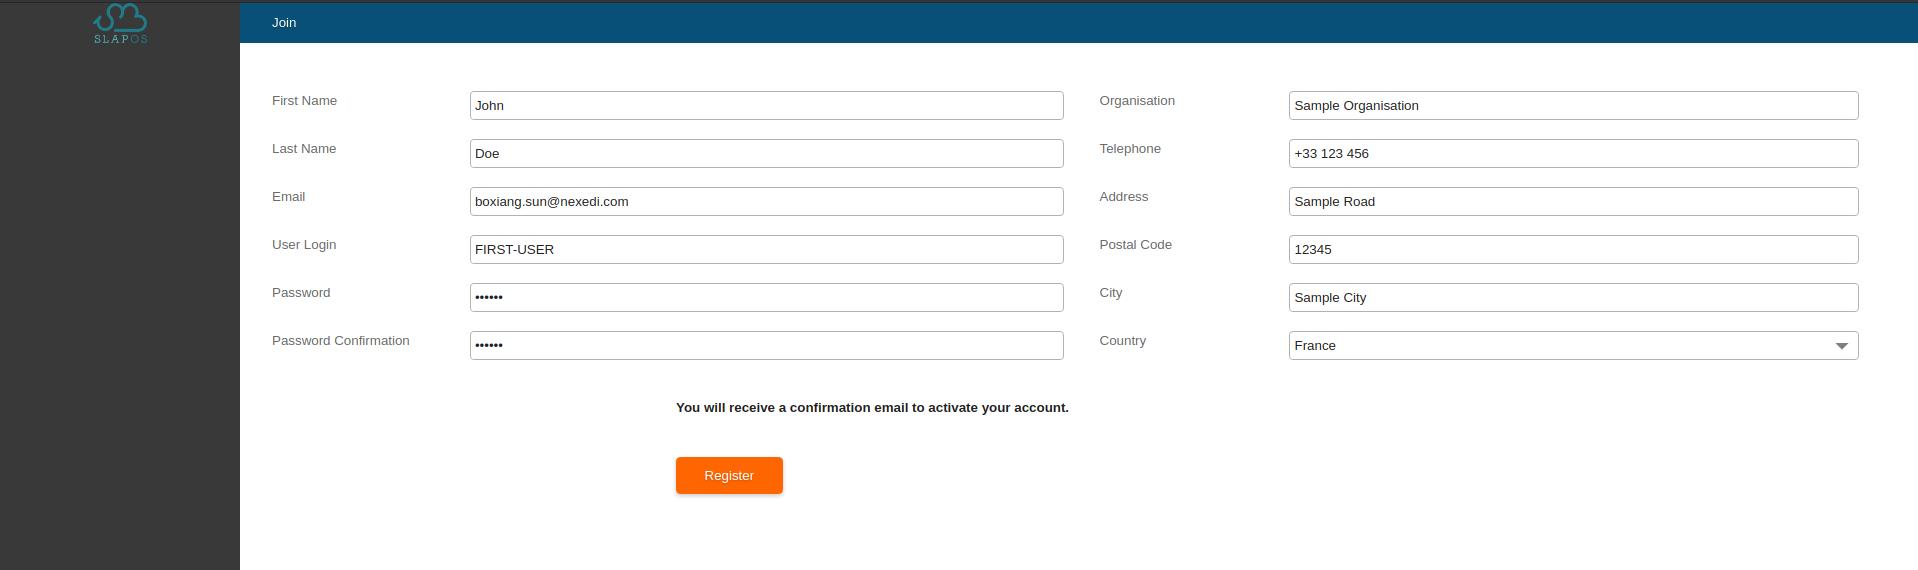 SlapOS Interface - User Registration